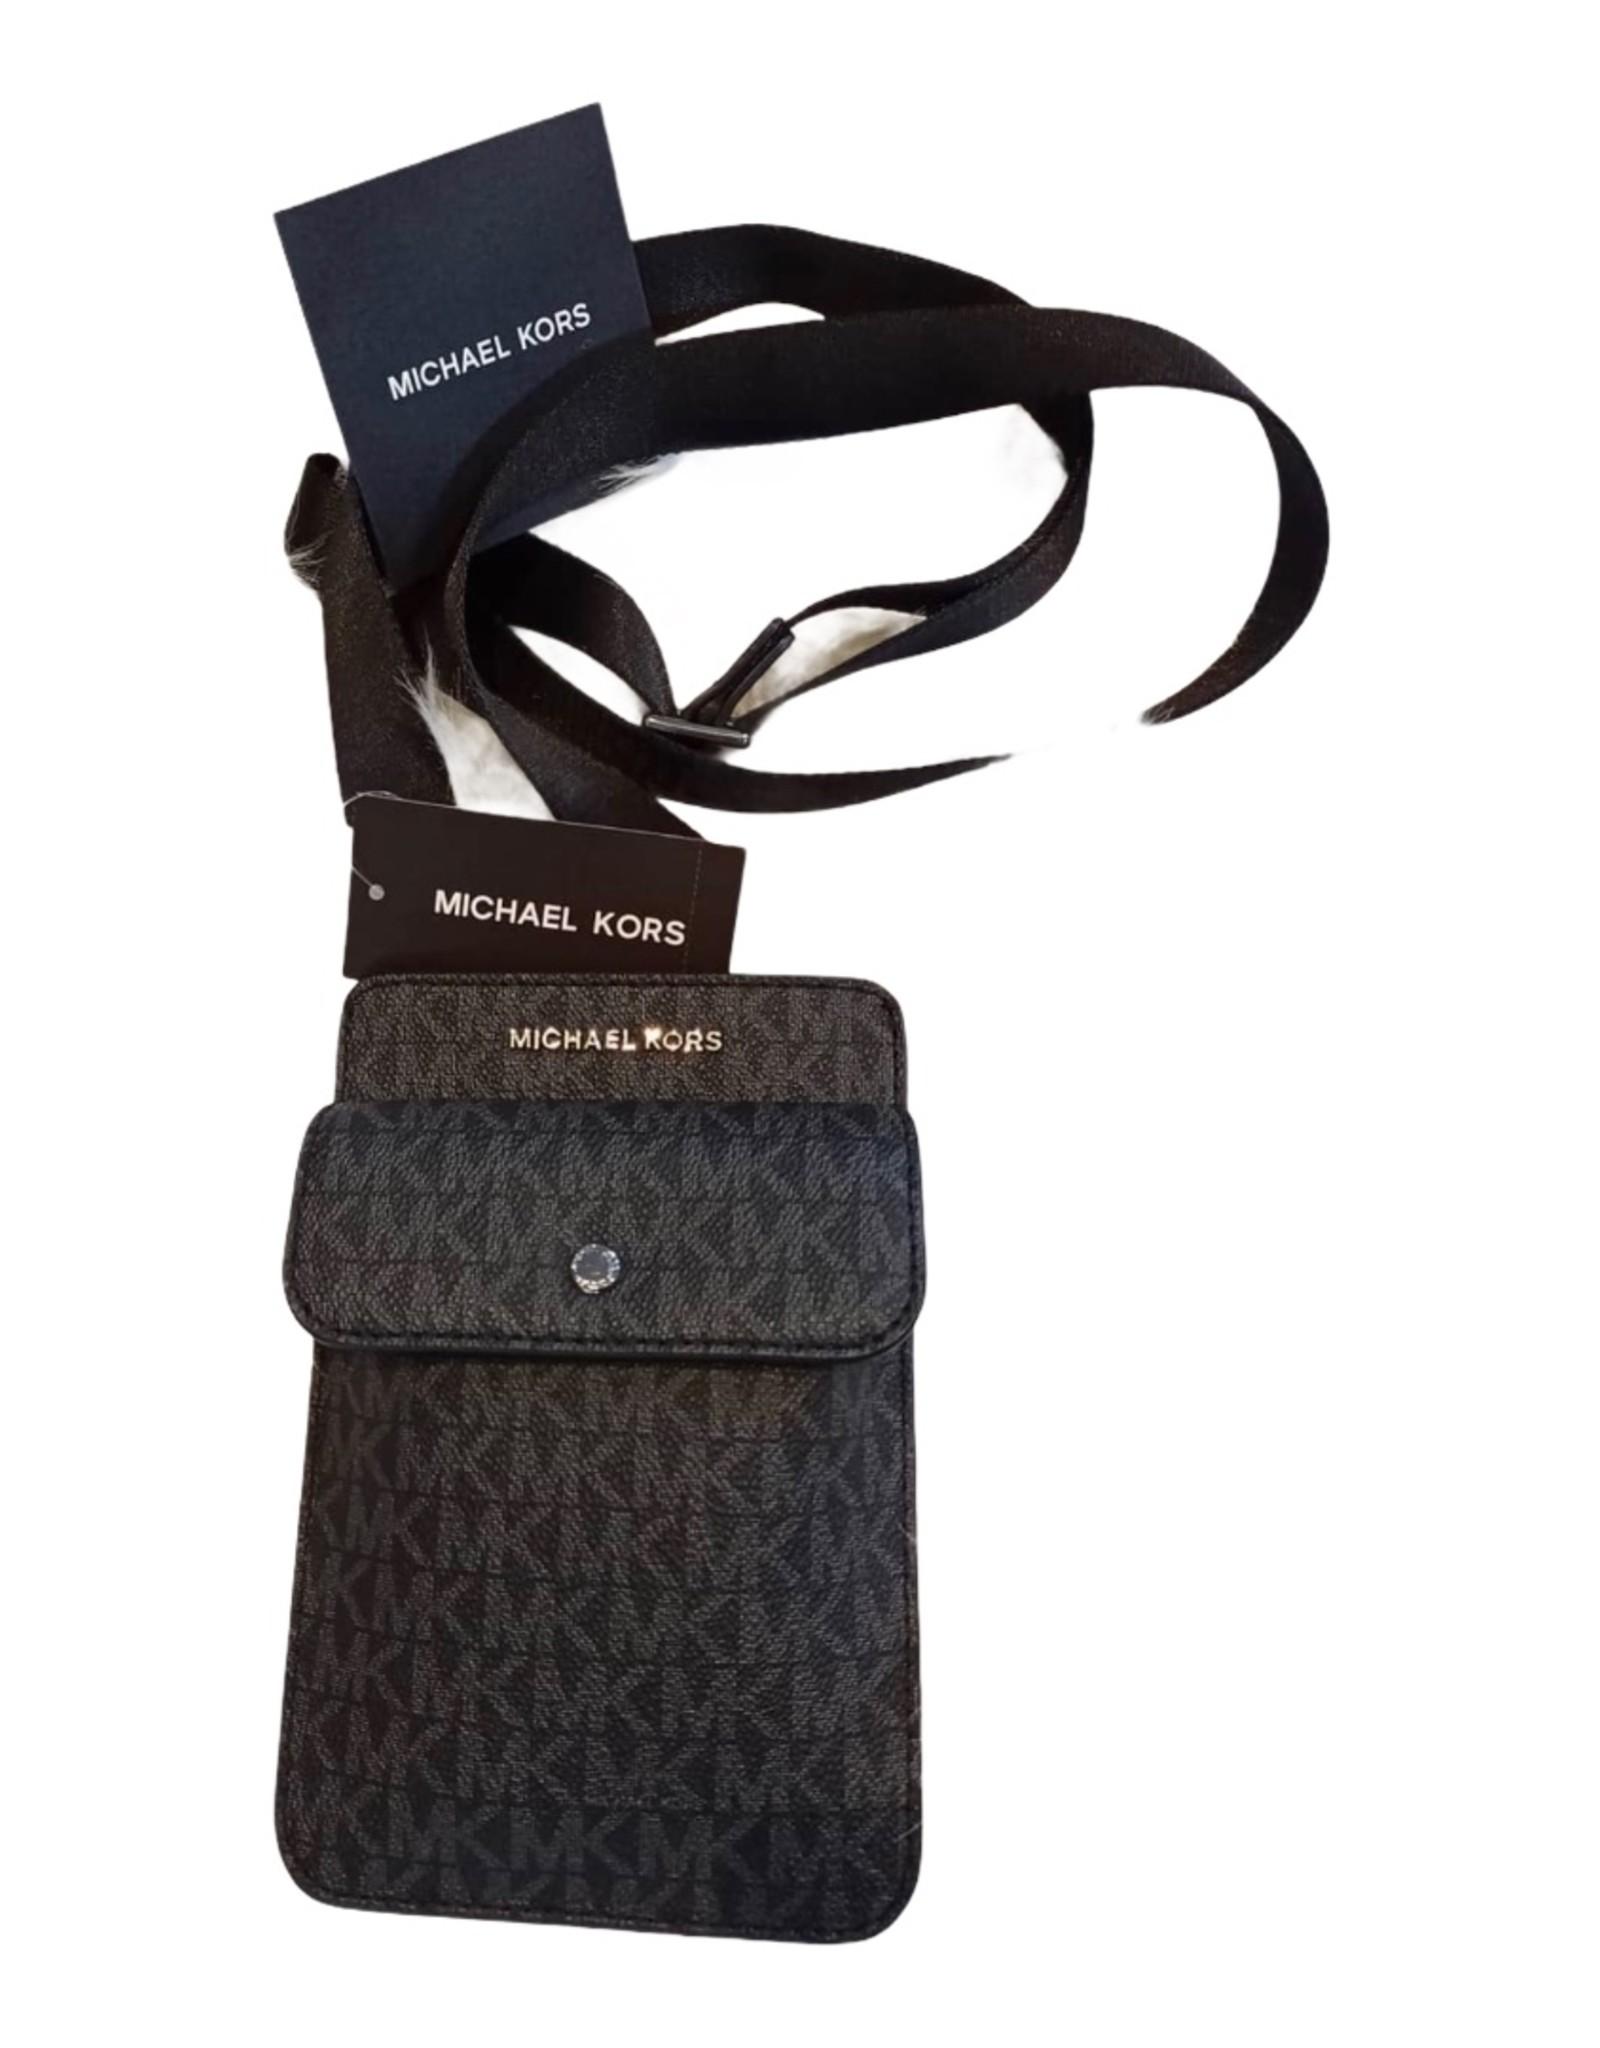 Michael Kors Michael Kors Slim Phone Crossbody